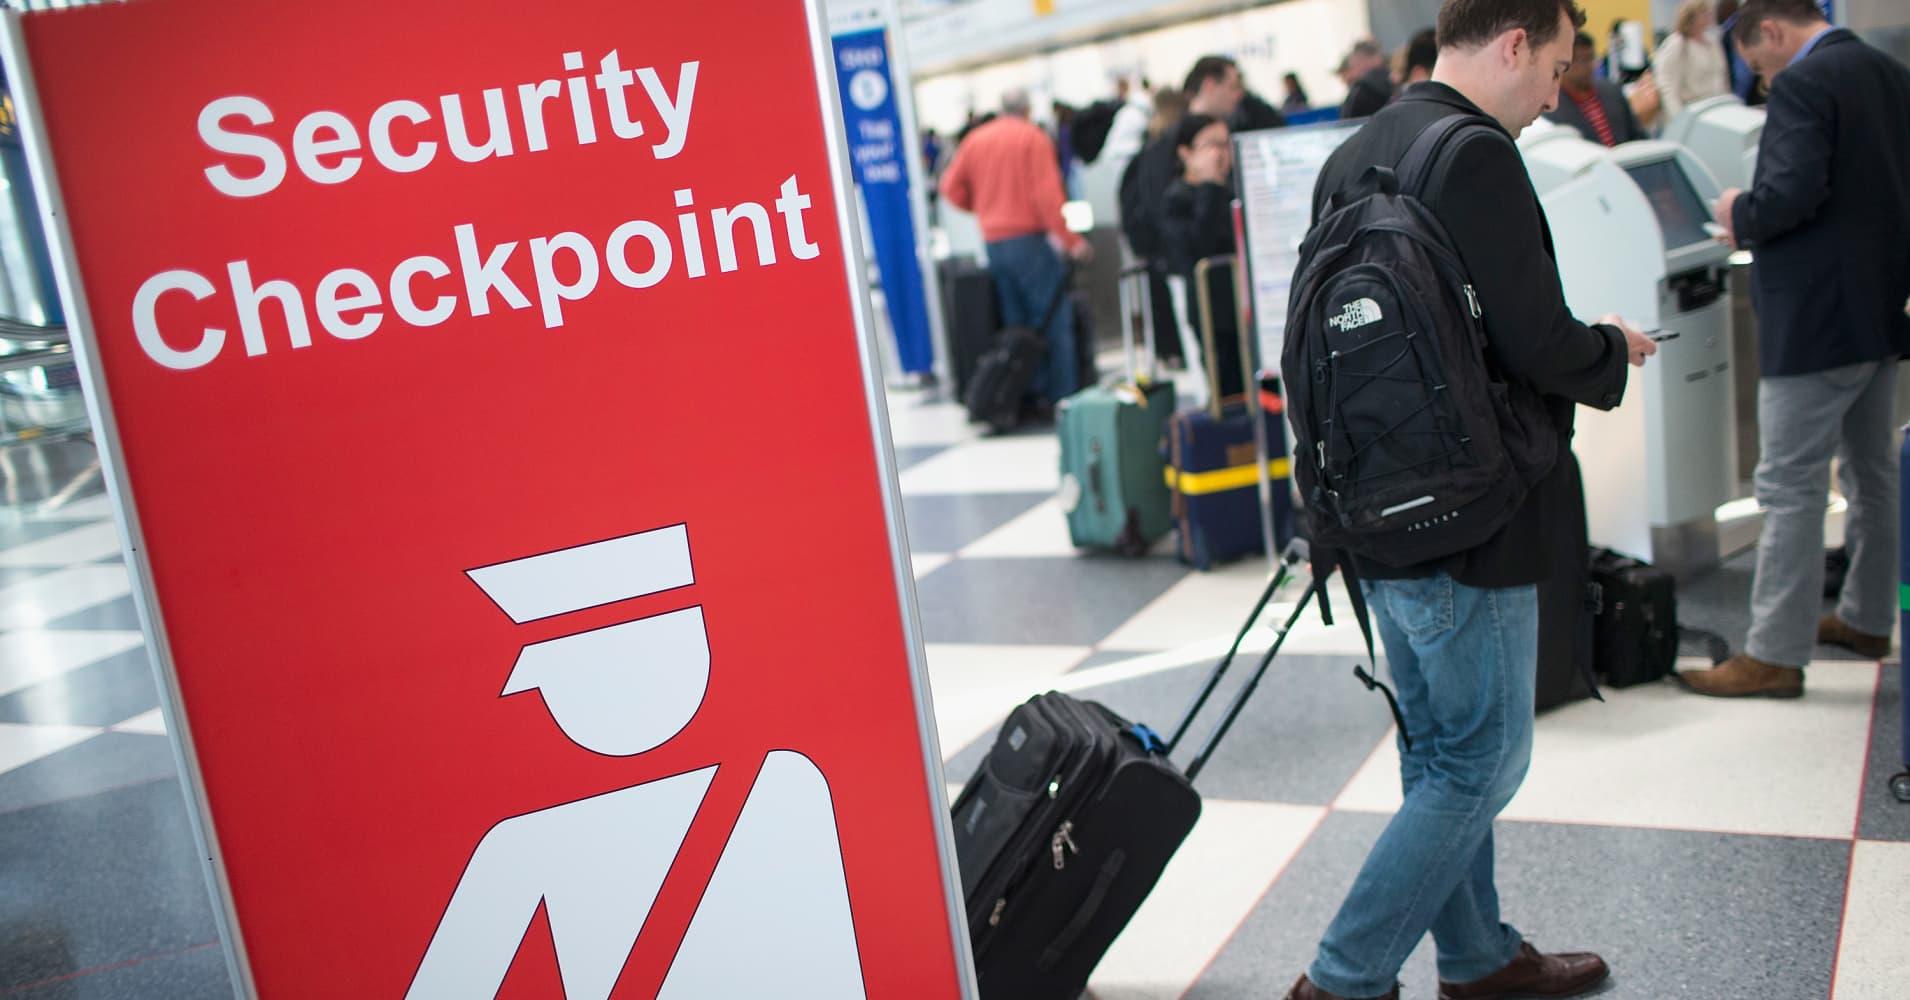 TSA to tighten screening of electronics at select airports